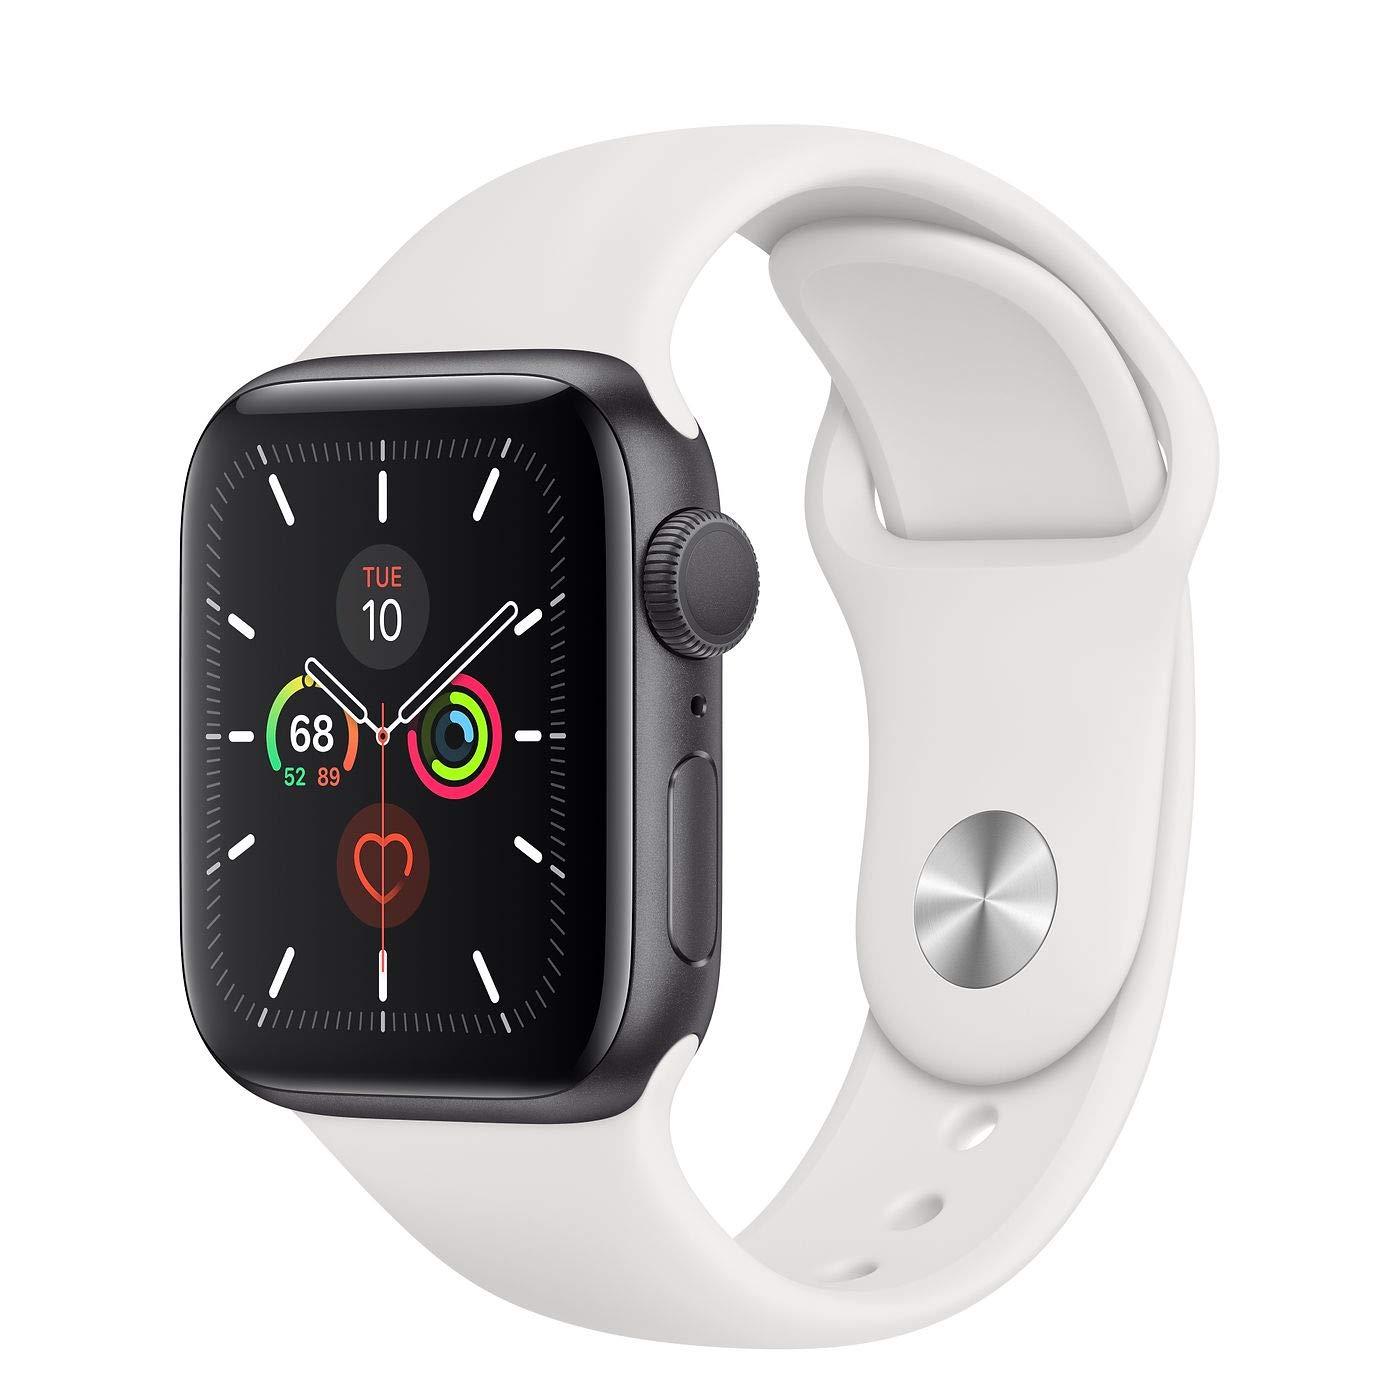 Mobirite W26 best fitness activity smartwatch under the price of 2000